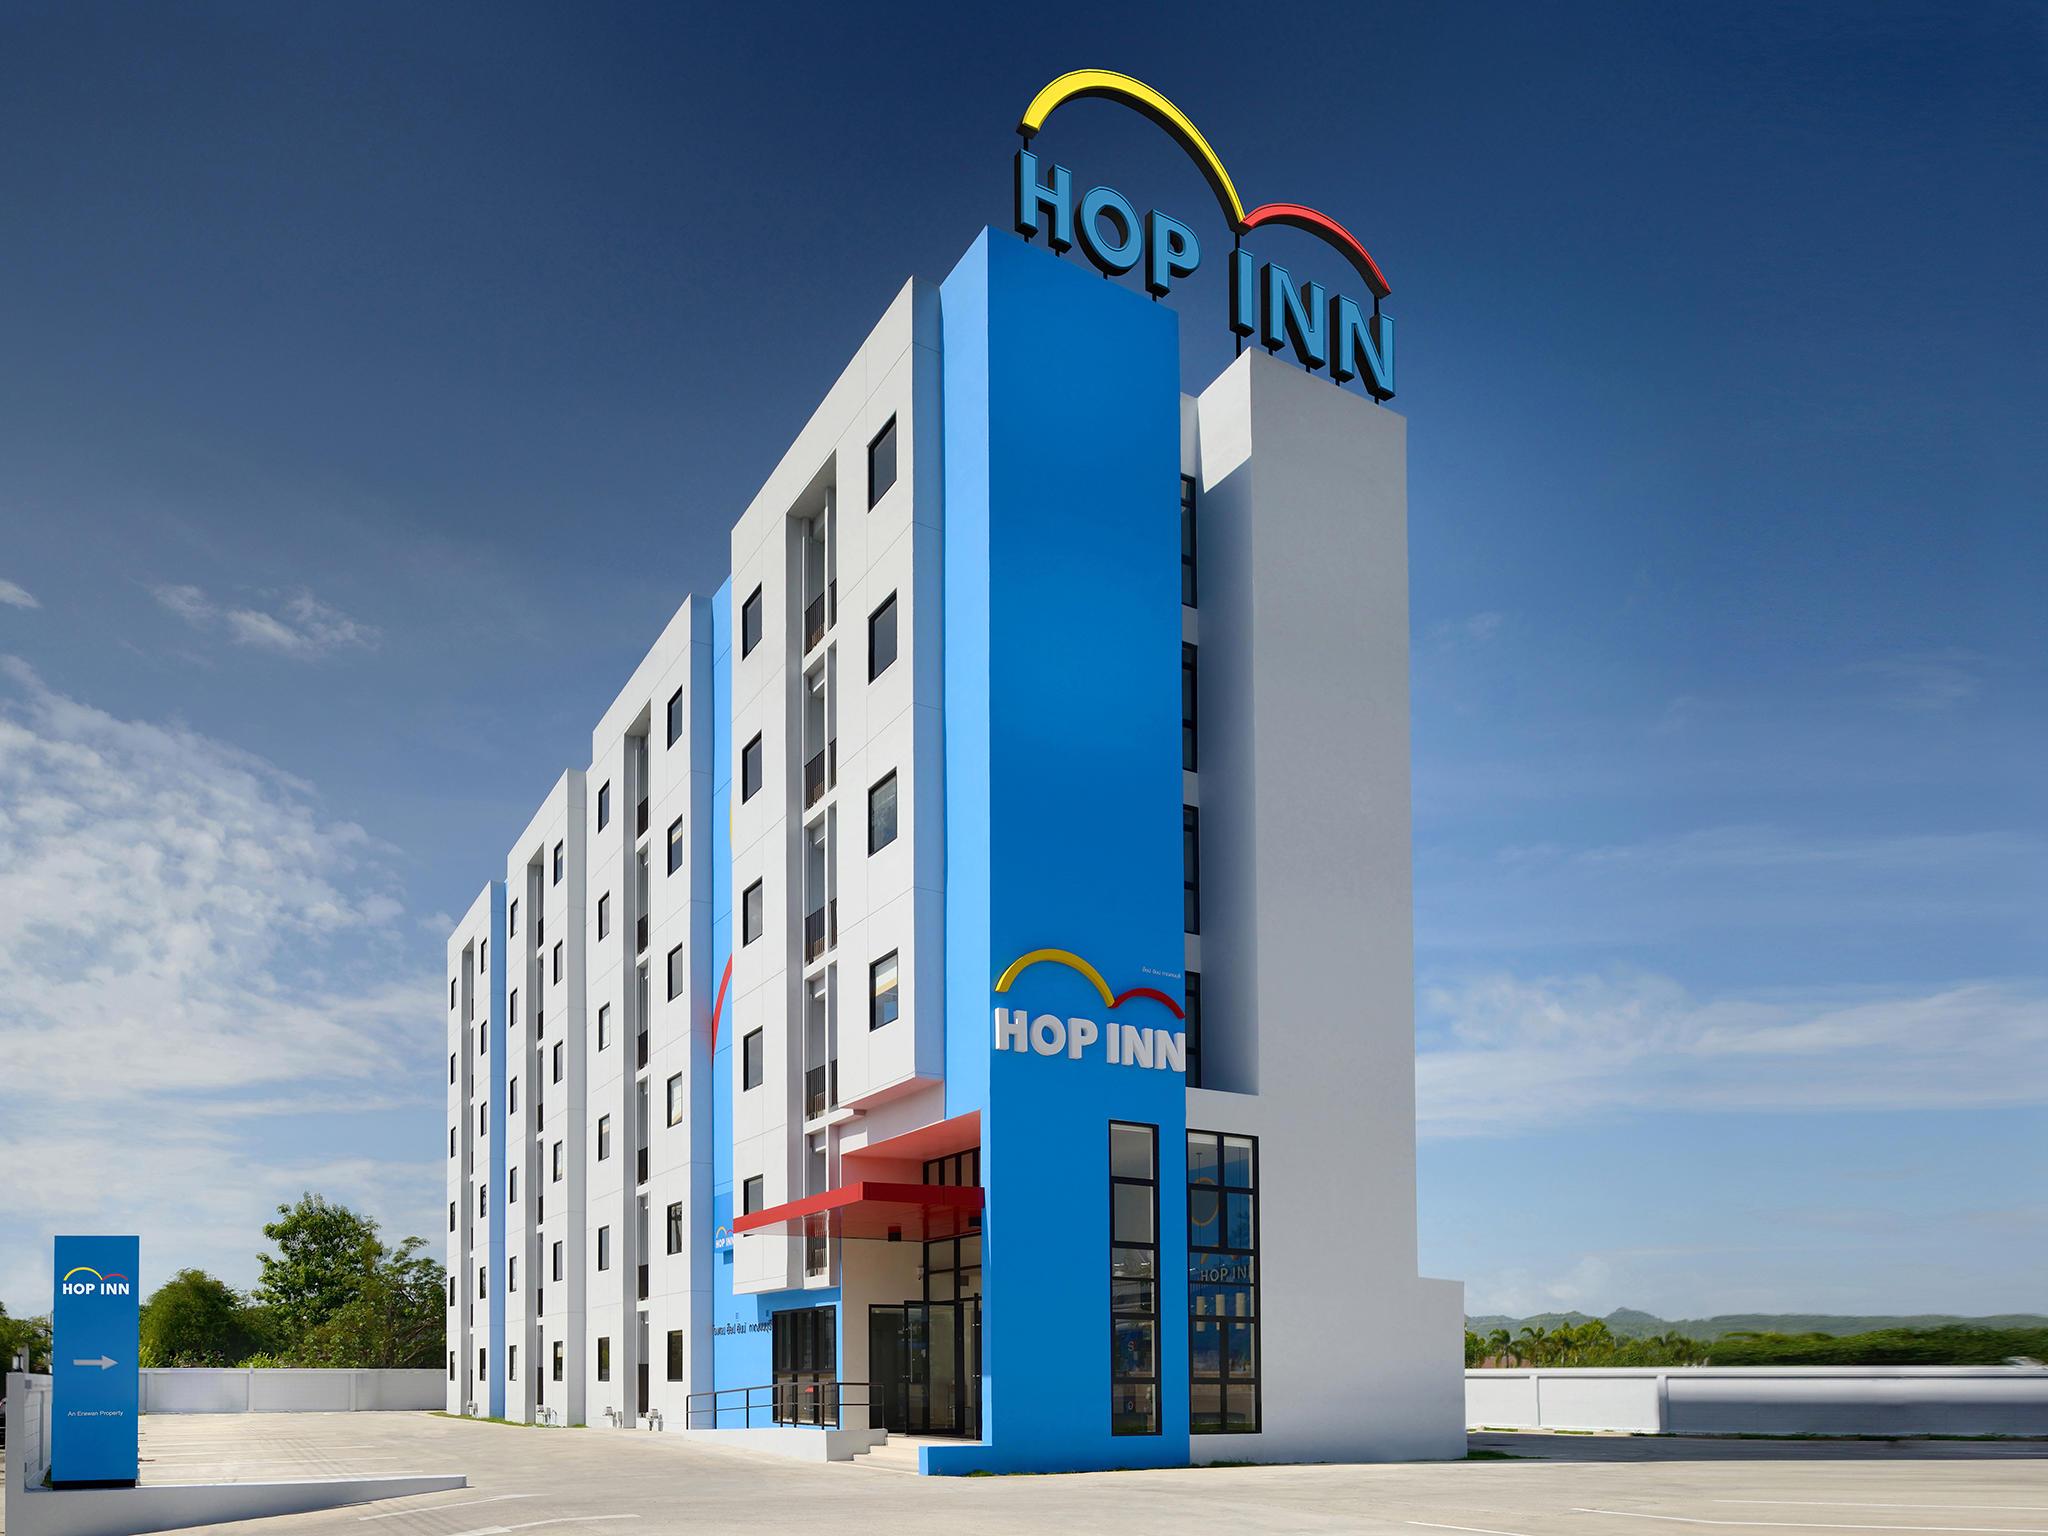 Hop Inn Hotel